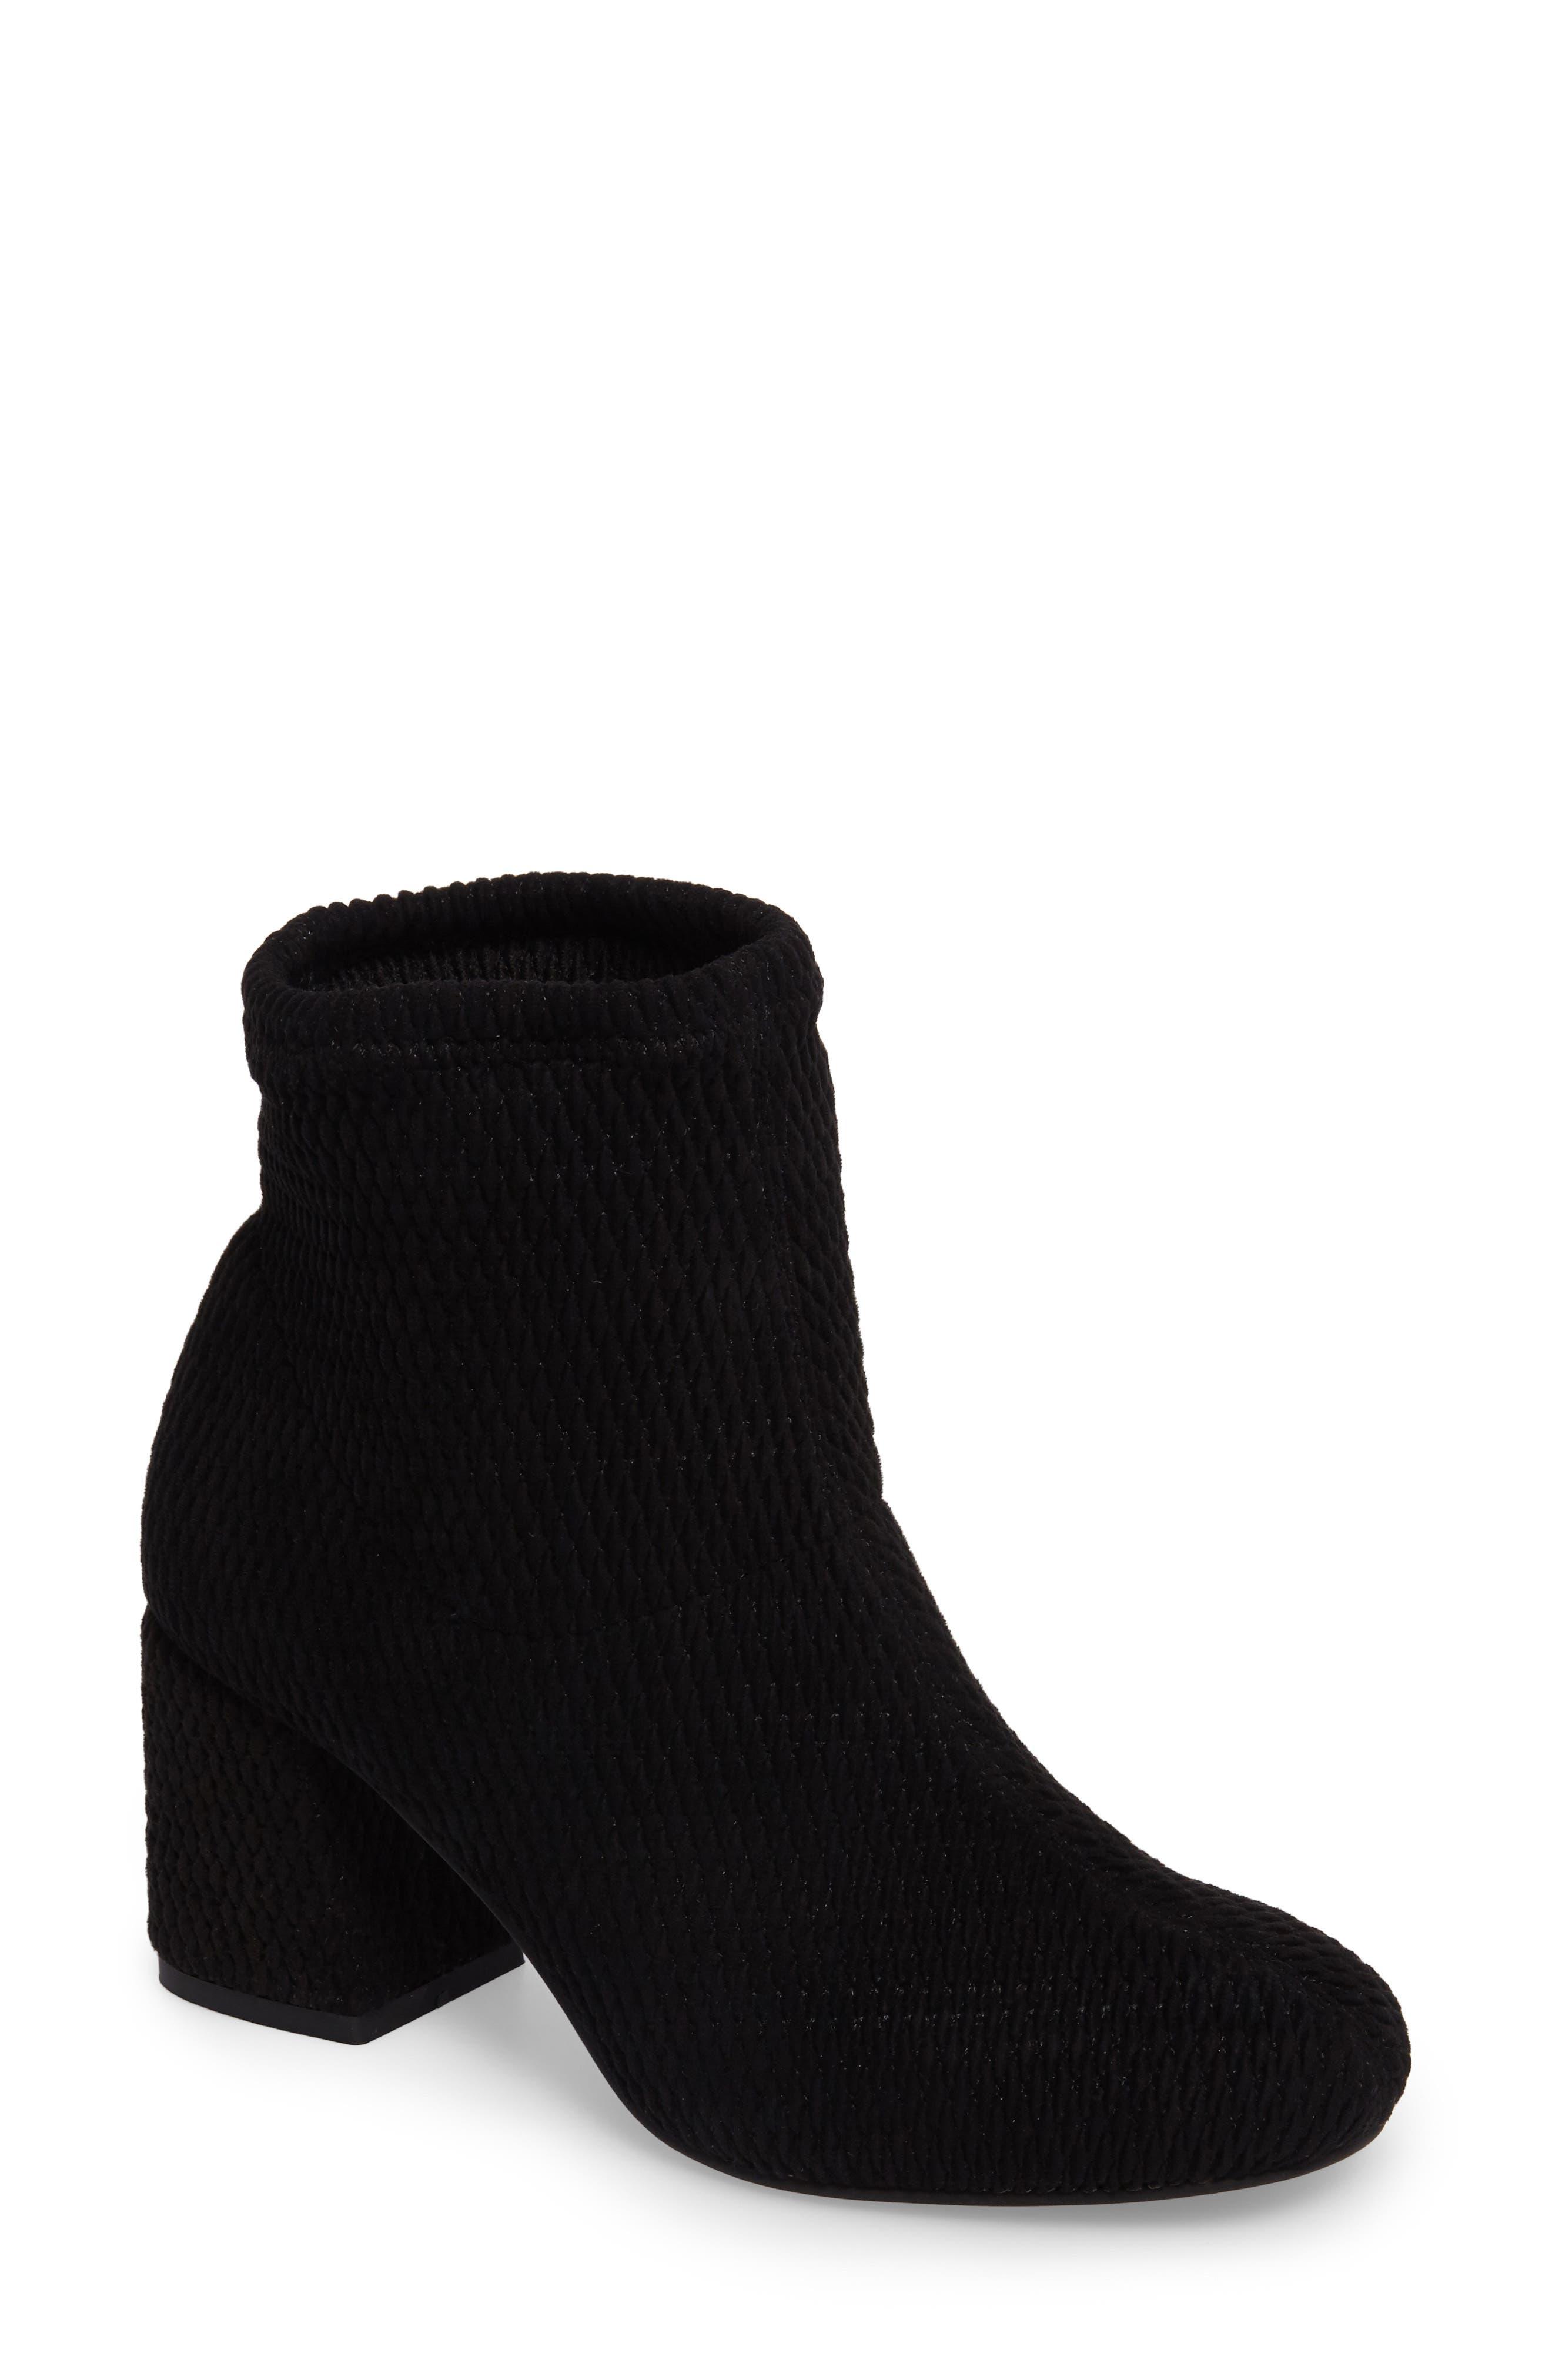 Ad Lib Sock Bootie,                         Main,                         color, Black Fabric